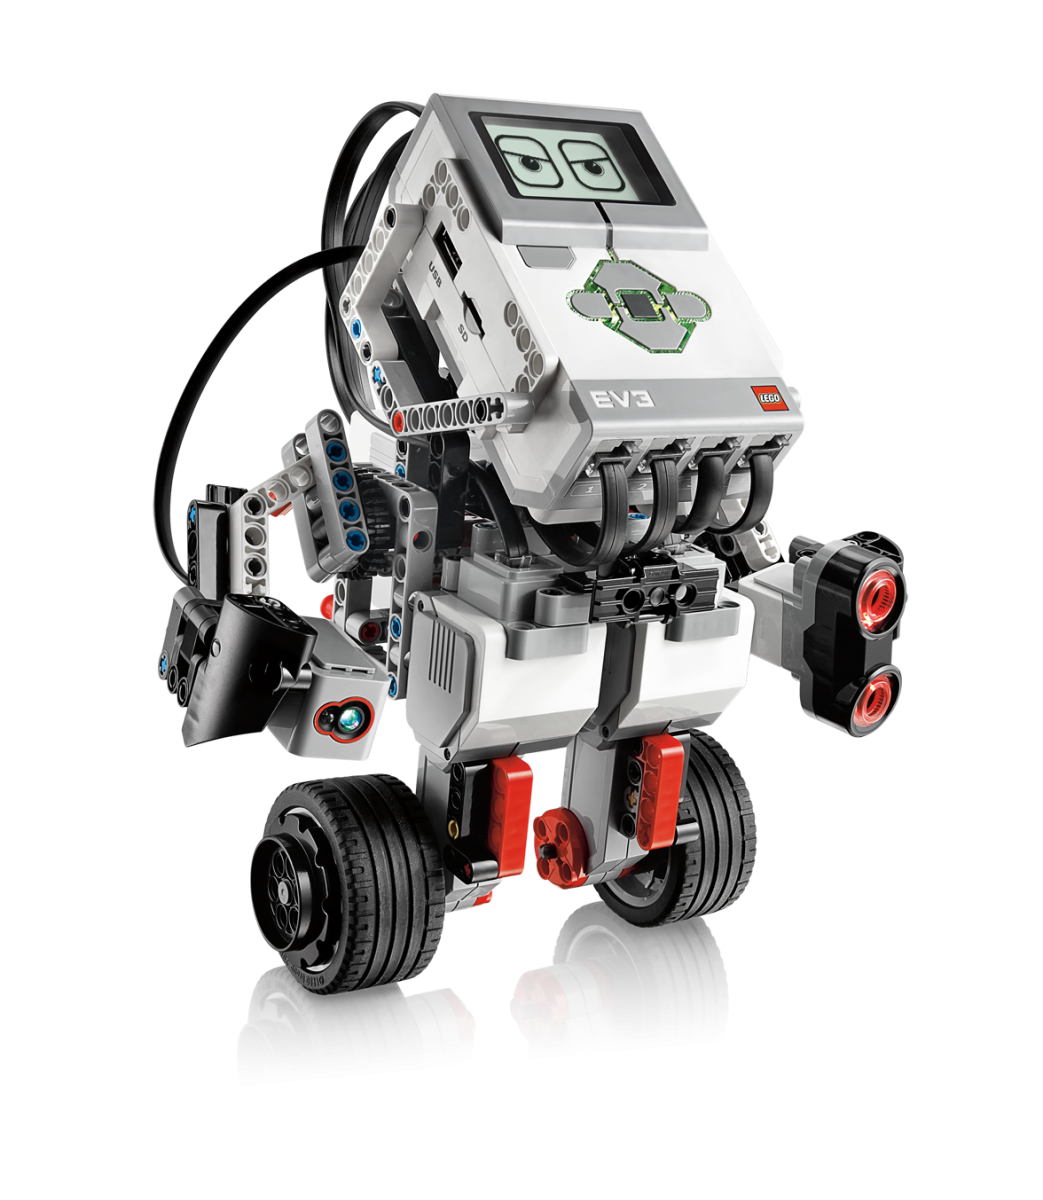 Alveol Academy Robotics